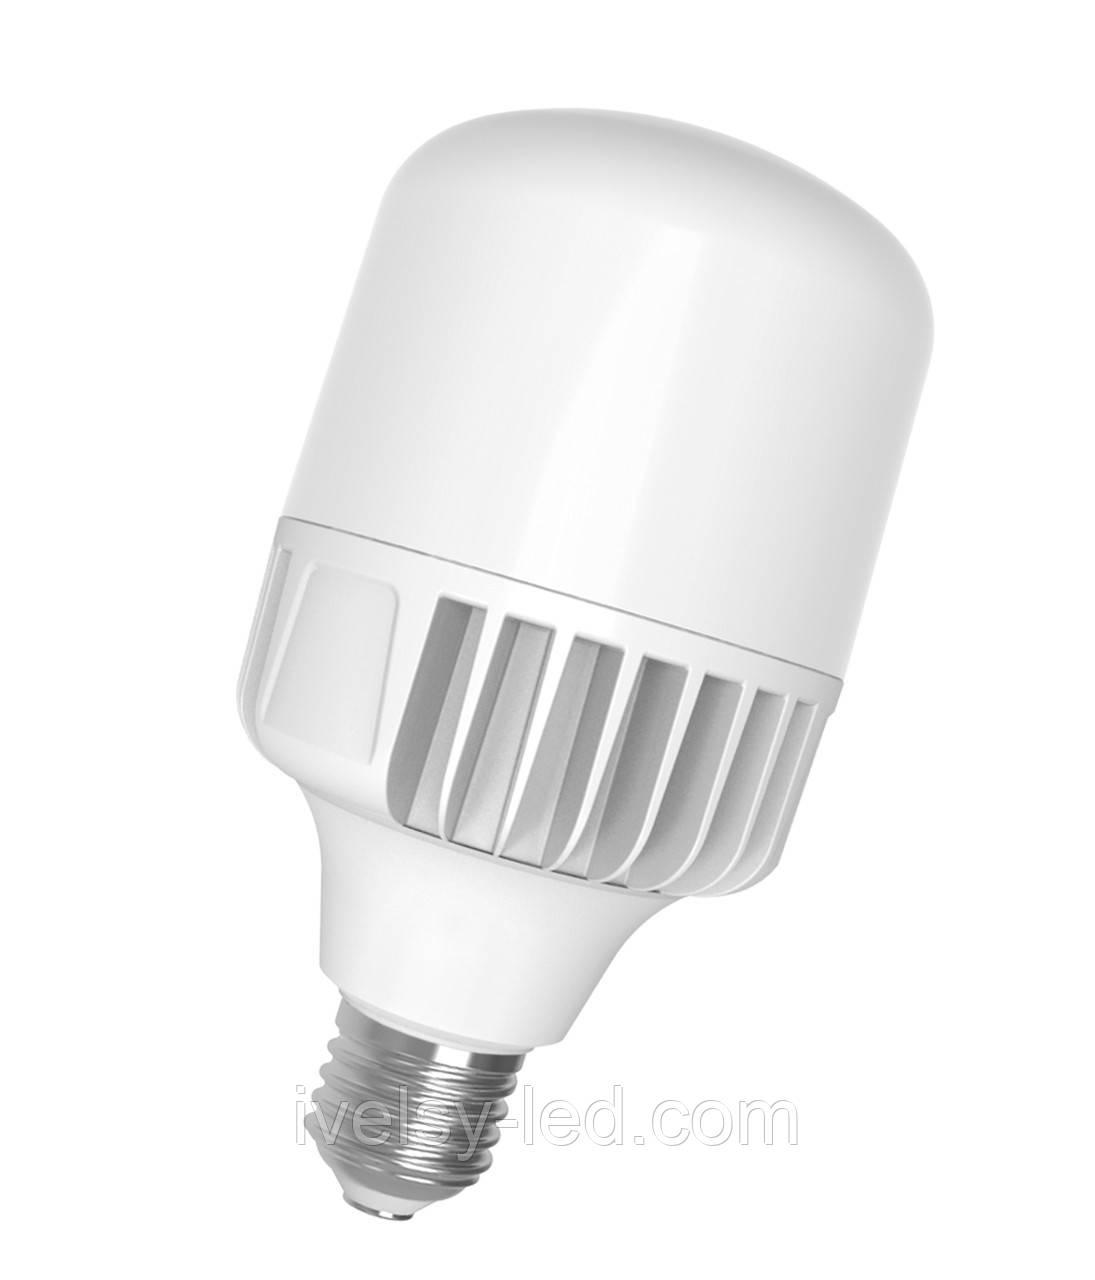 LED Лампа EUROLAMP високопотужна 40W E40 6500K